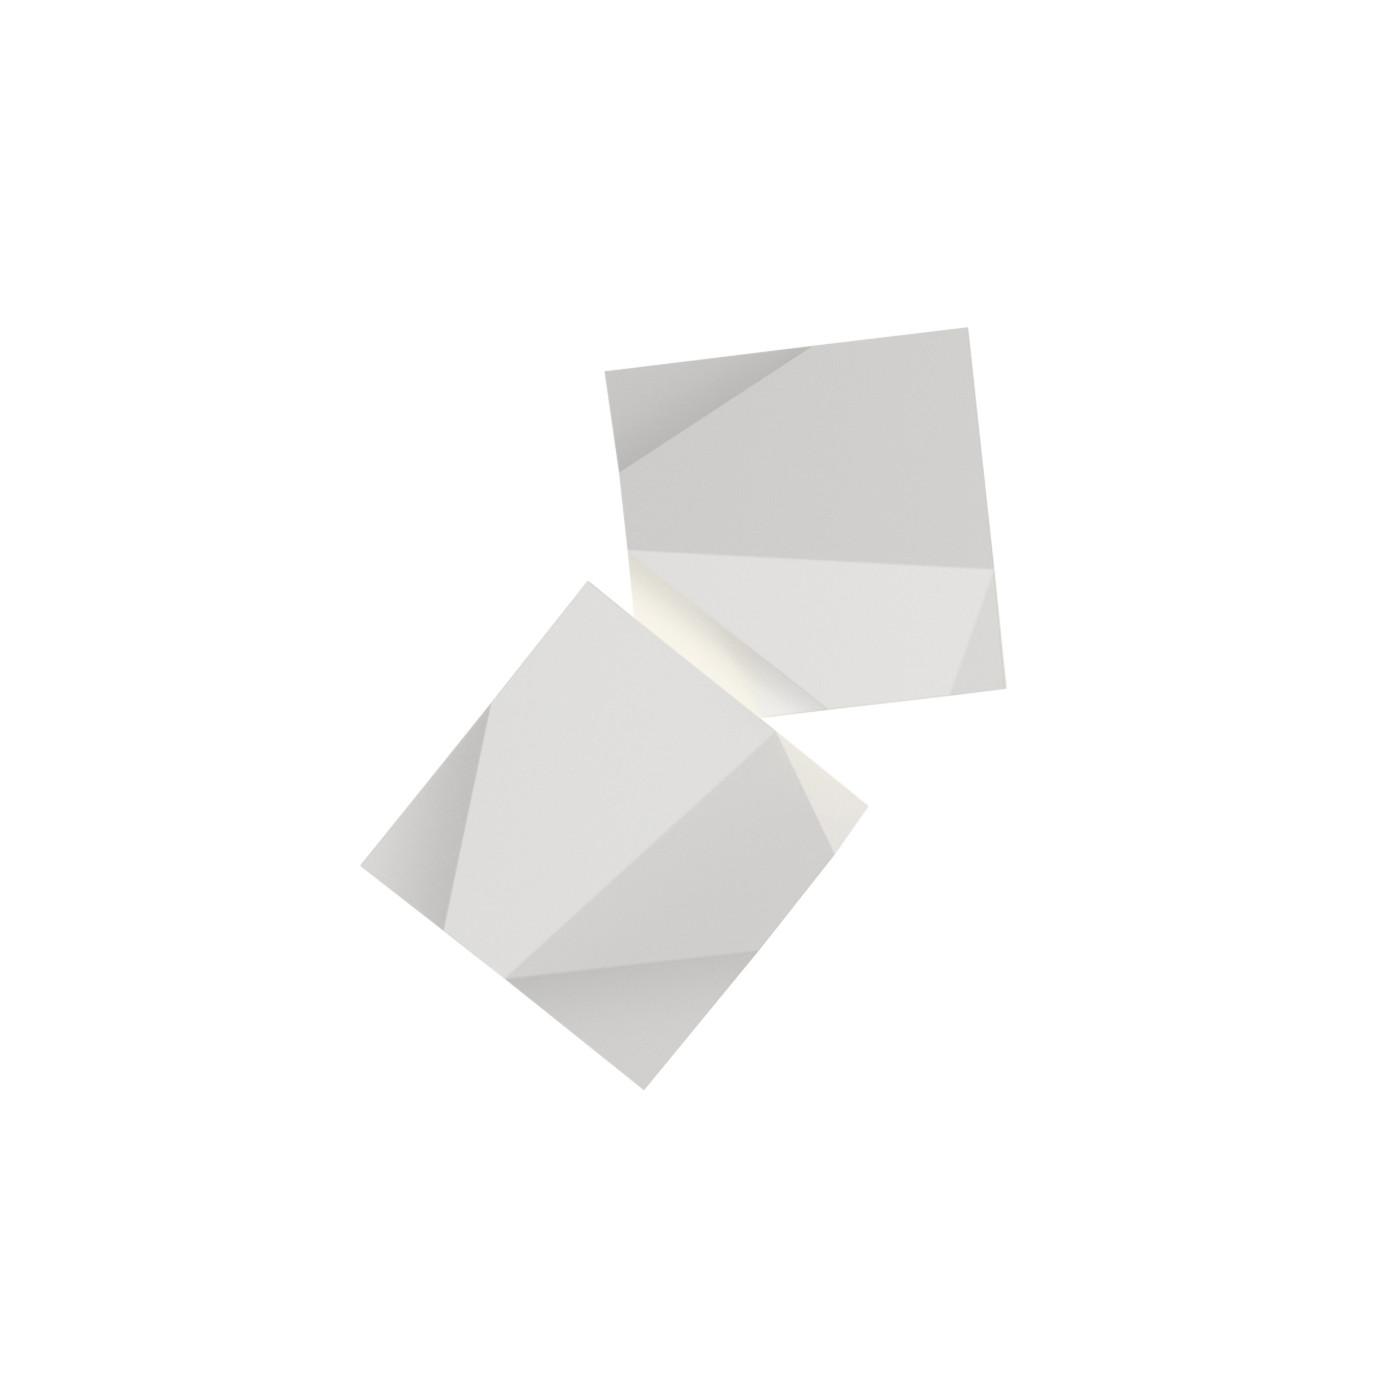 Vibia Origami 4504 Wandleuchte